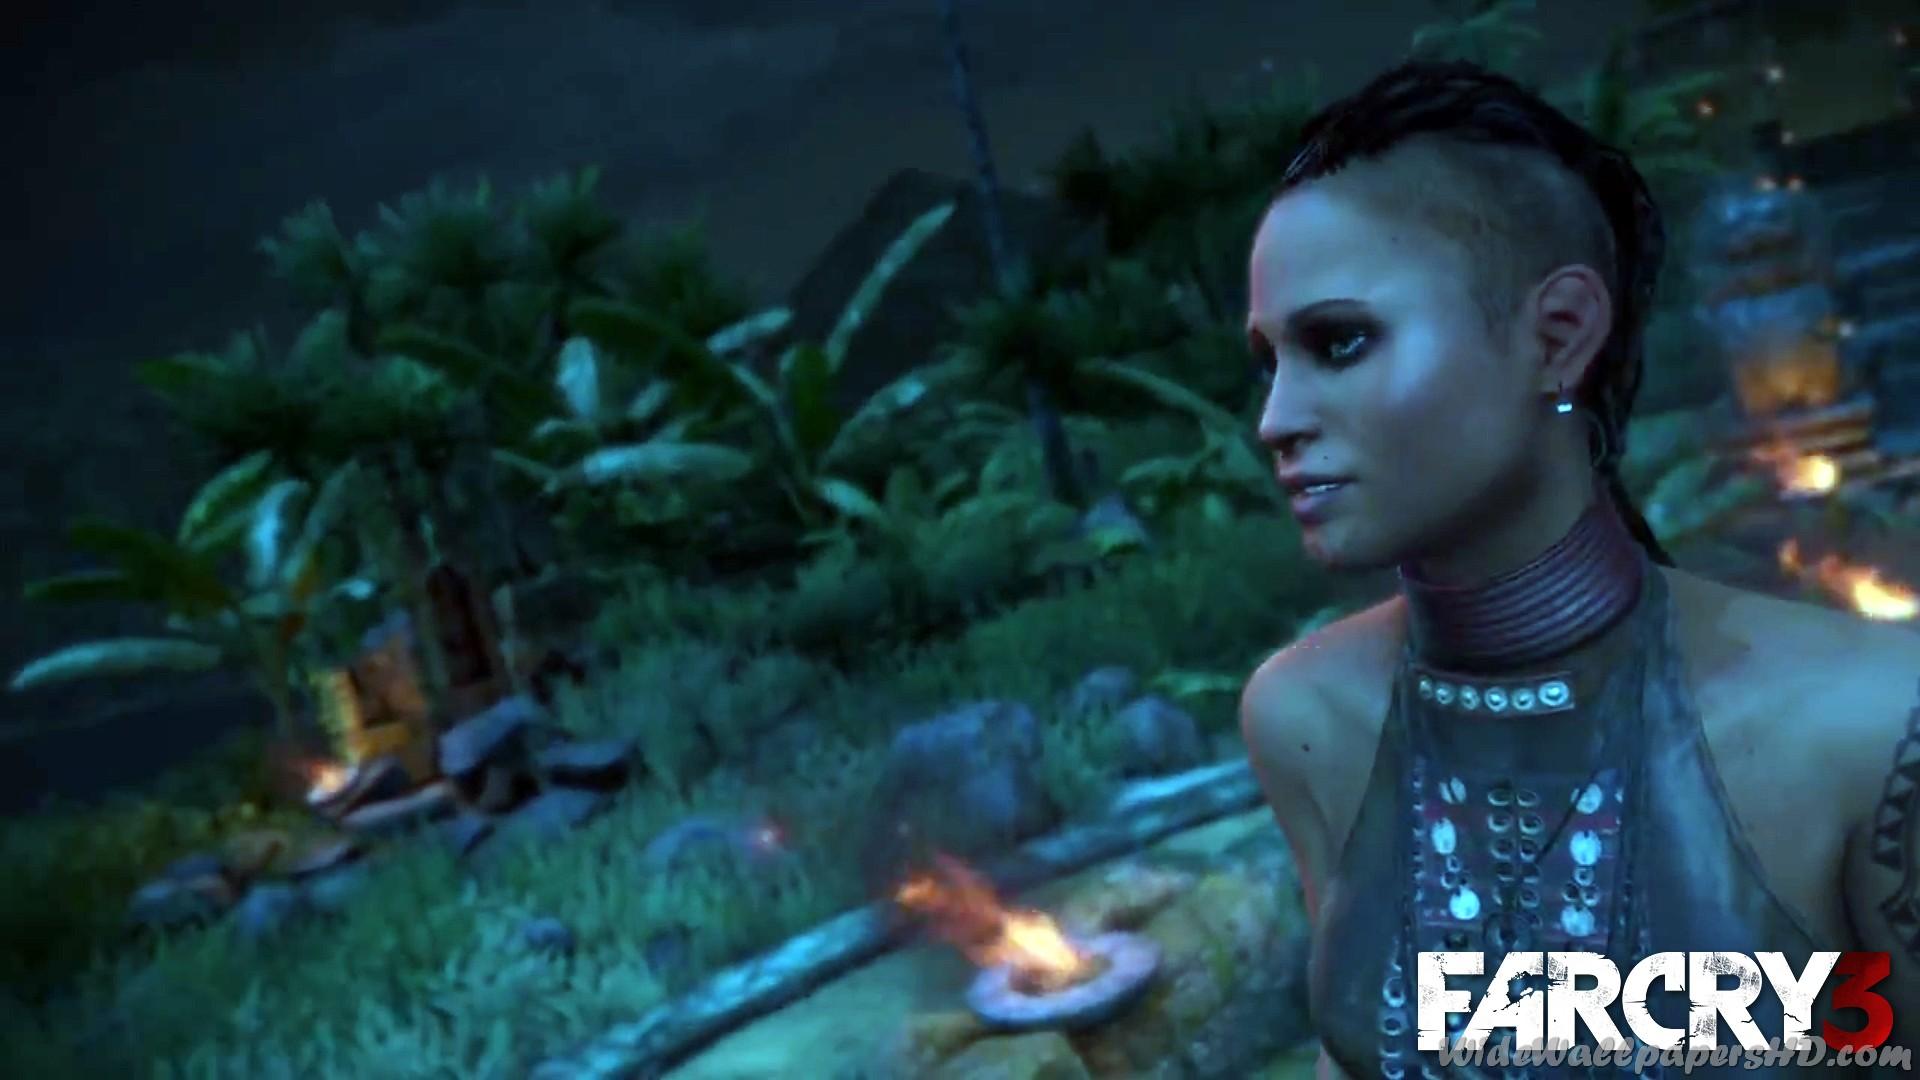 Free Download Far Cry 3 Wallpaper 1080p 9461 Wallpaper Game